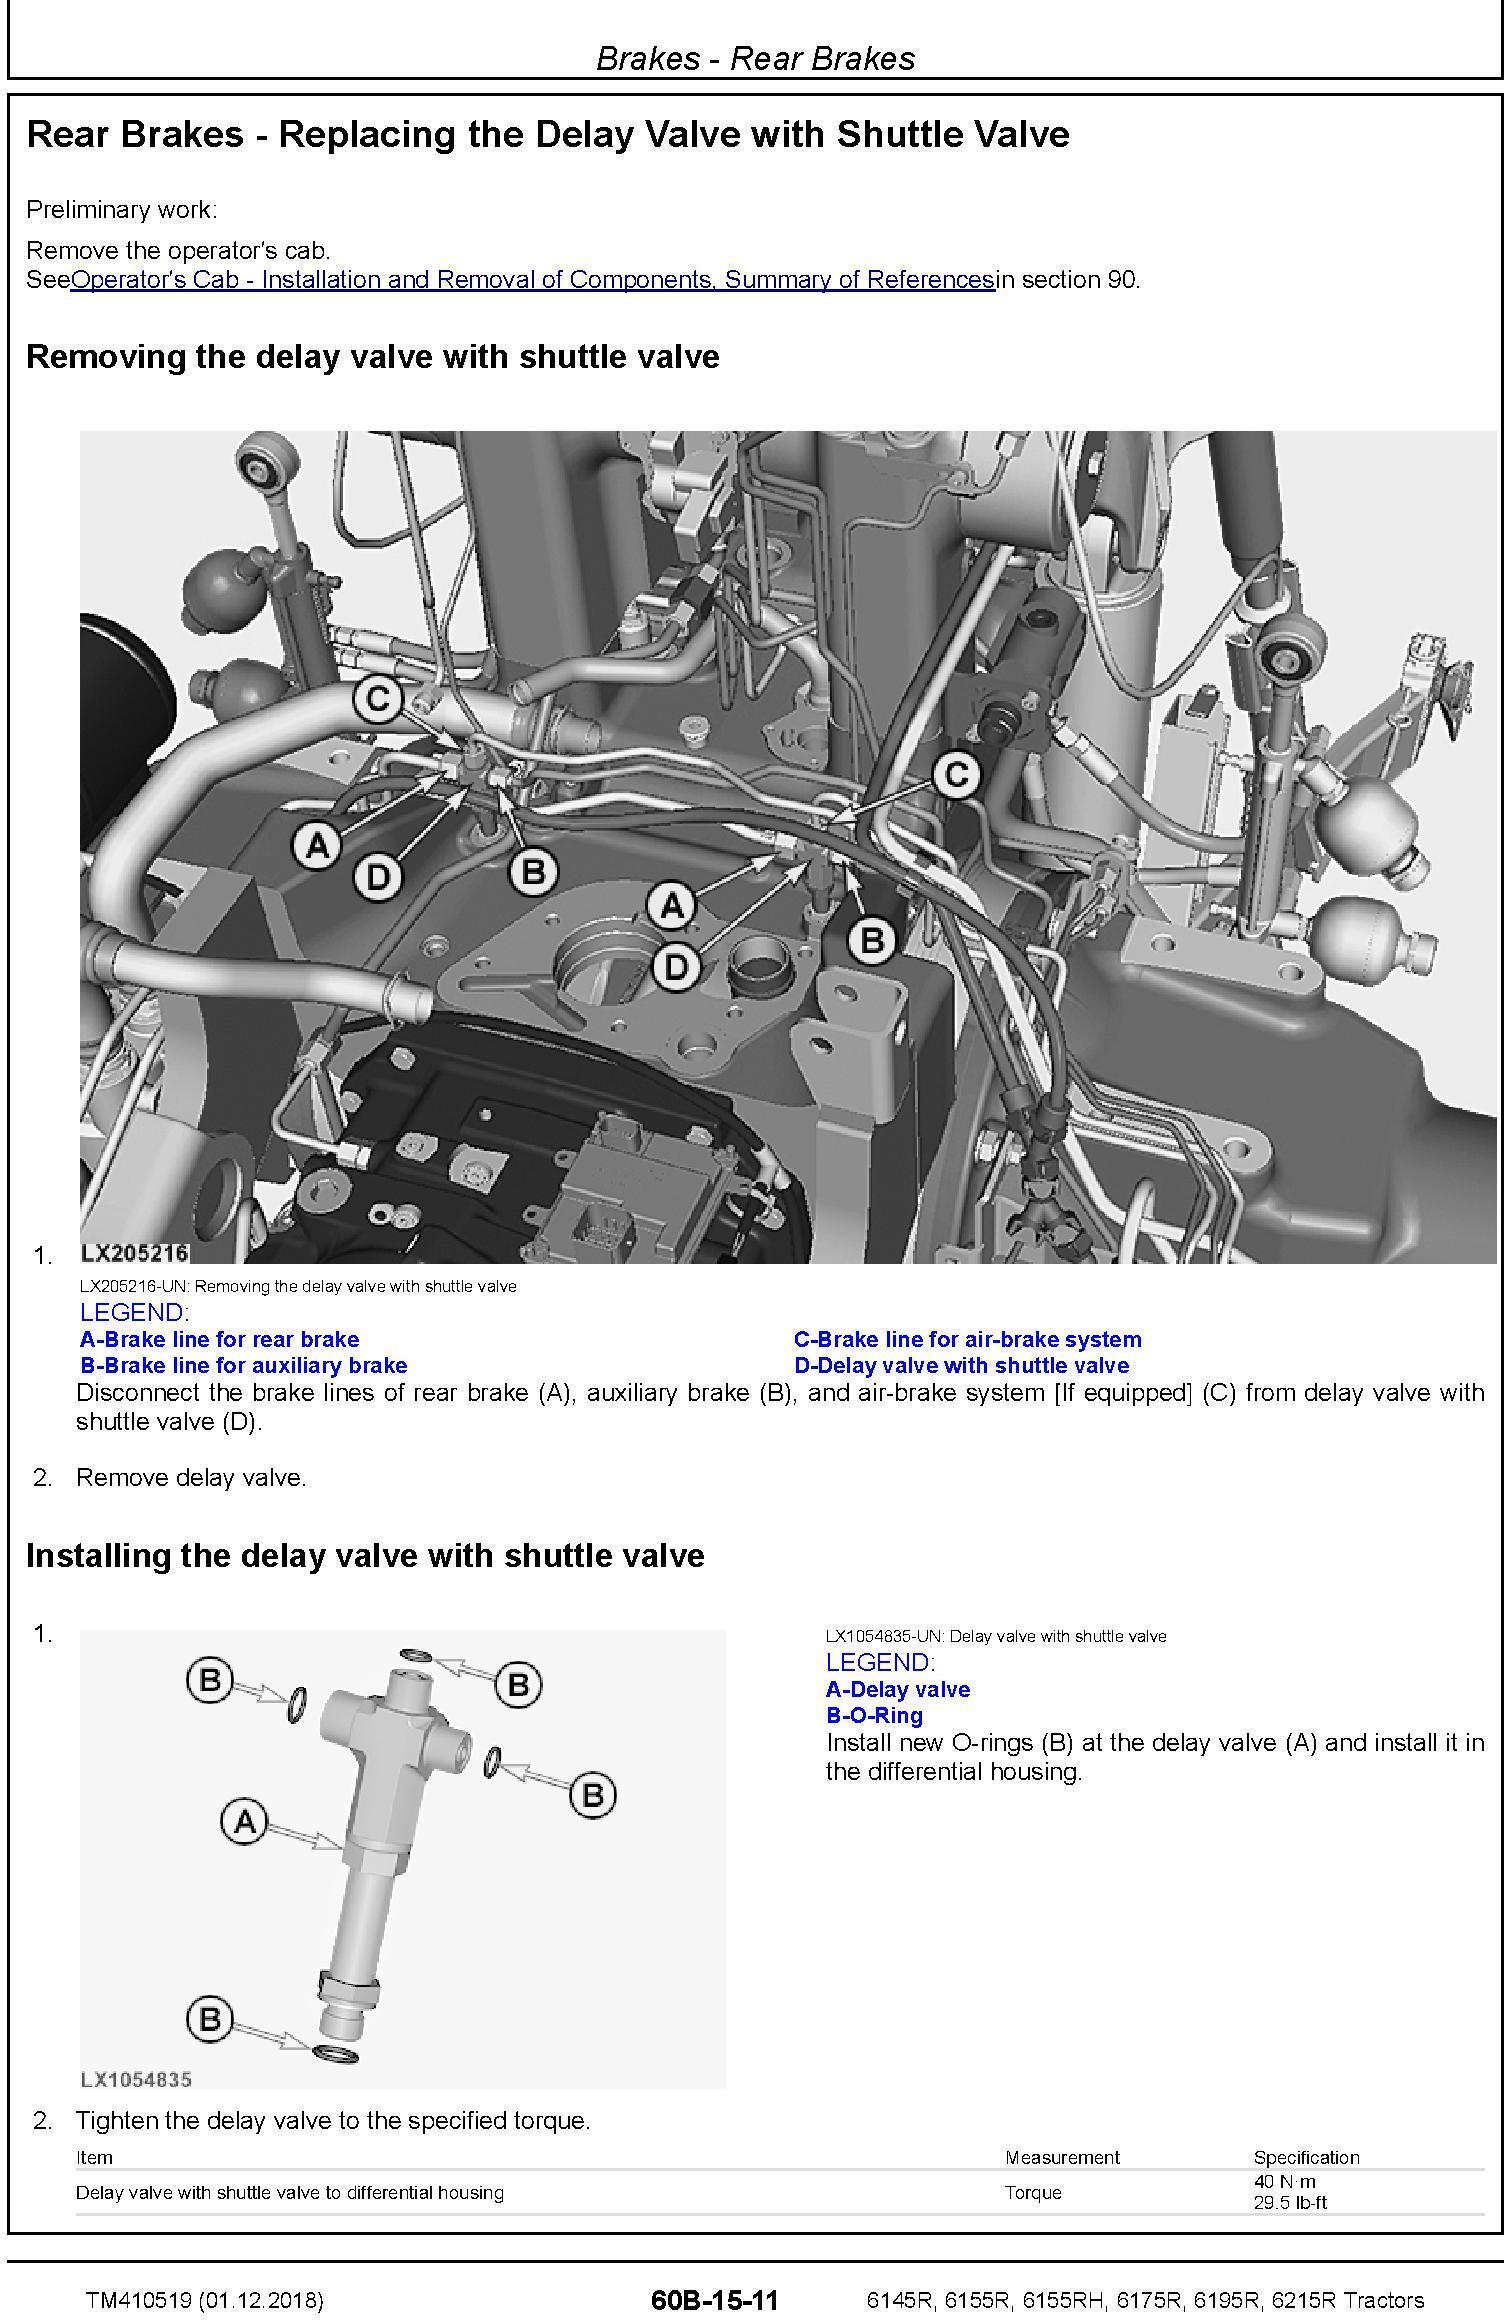 John Deere 6145R, 6155R, 6155RH, 6175R, 6195R, 6215R MY18 Tractor Repair Technical Manual (TM410519) - 1